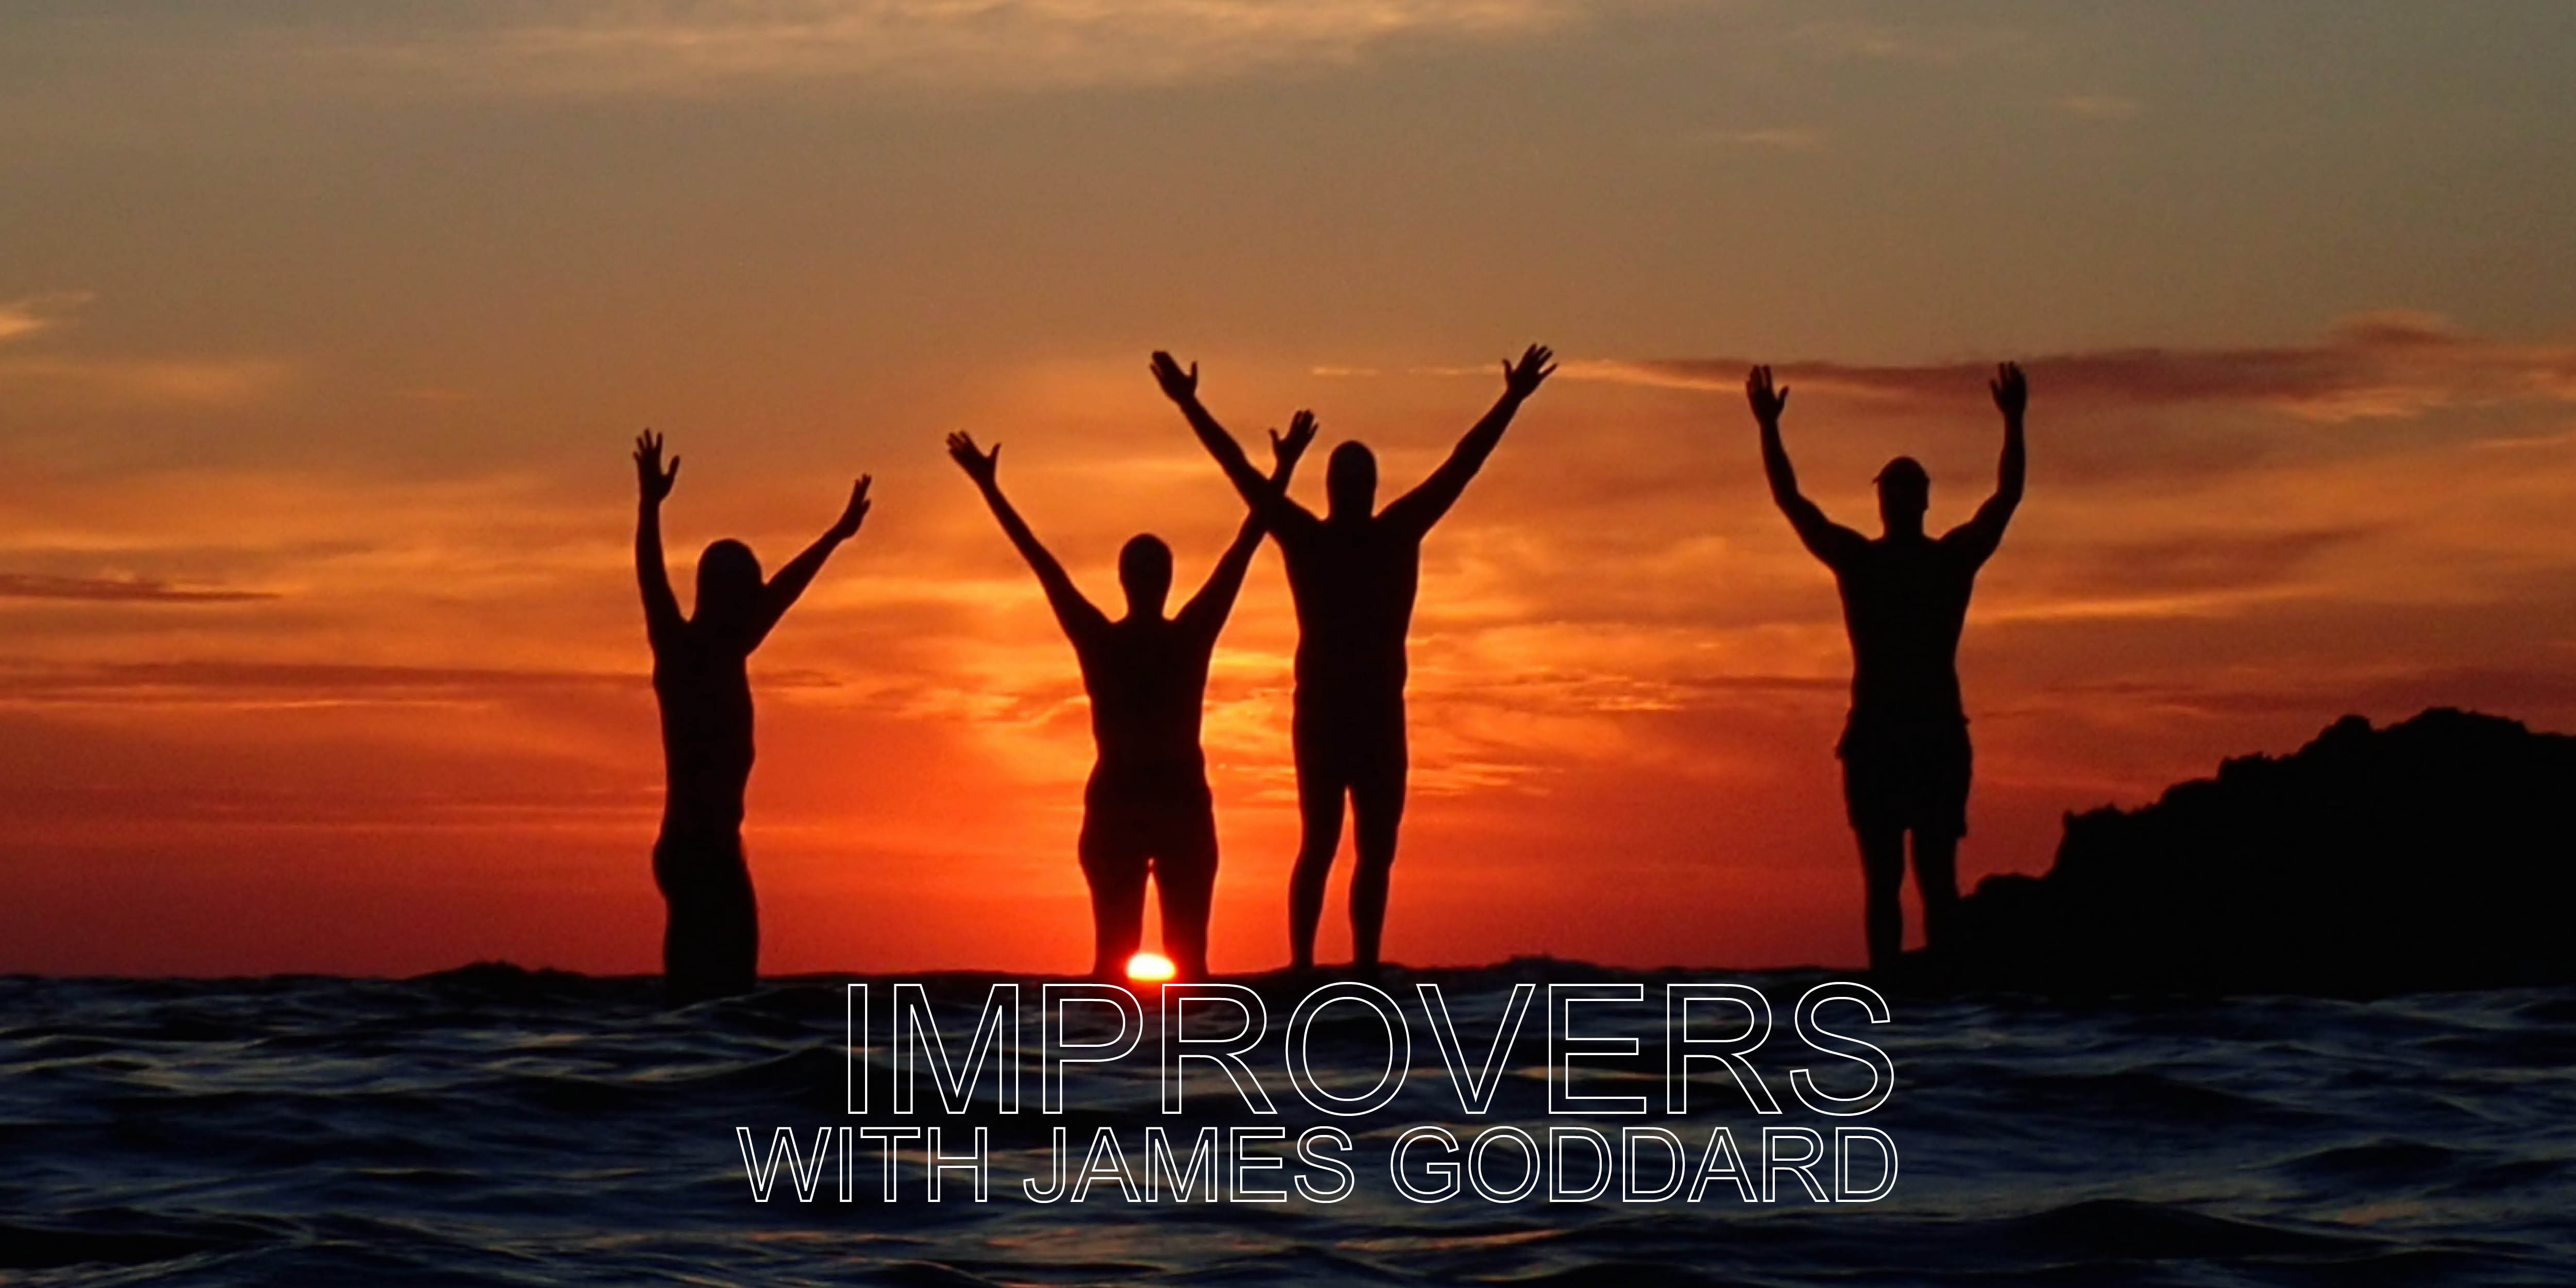 SwimQuest Improvers James Goddard